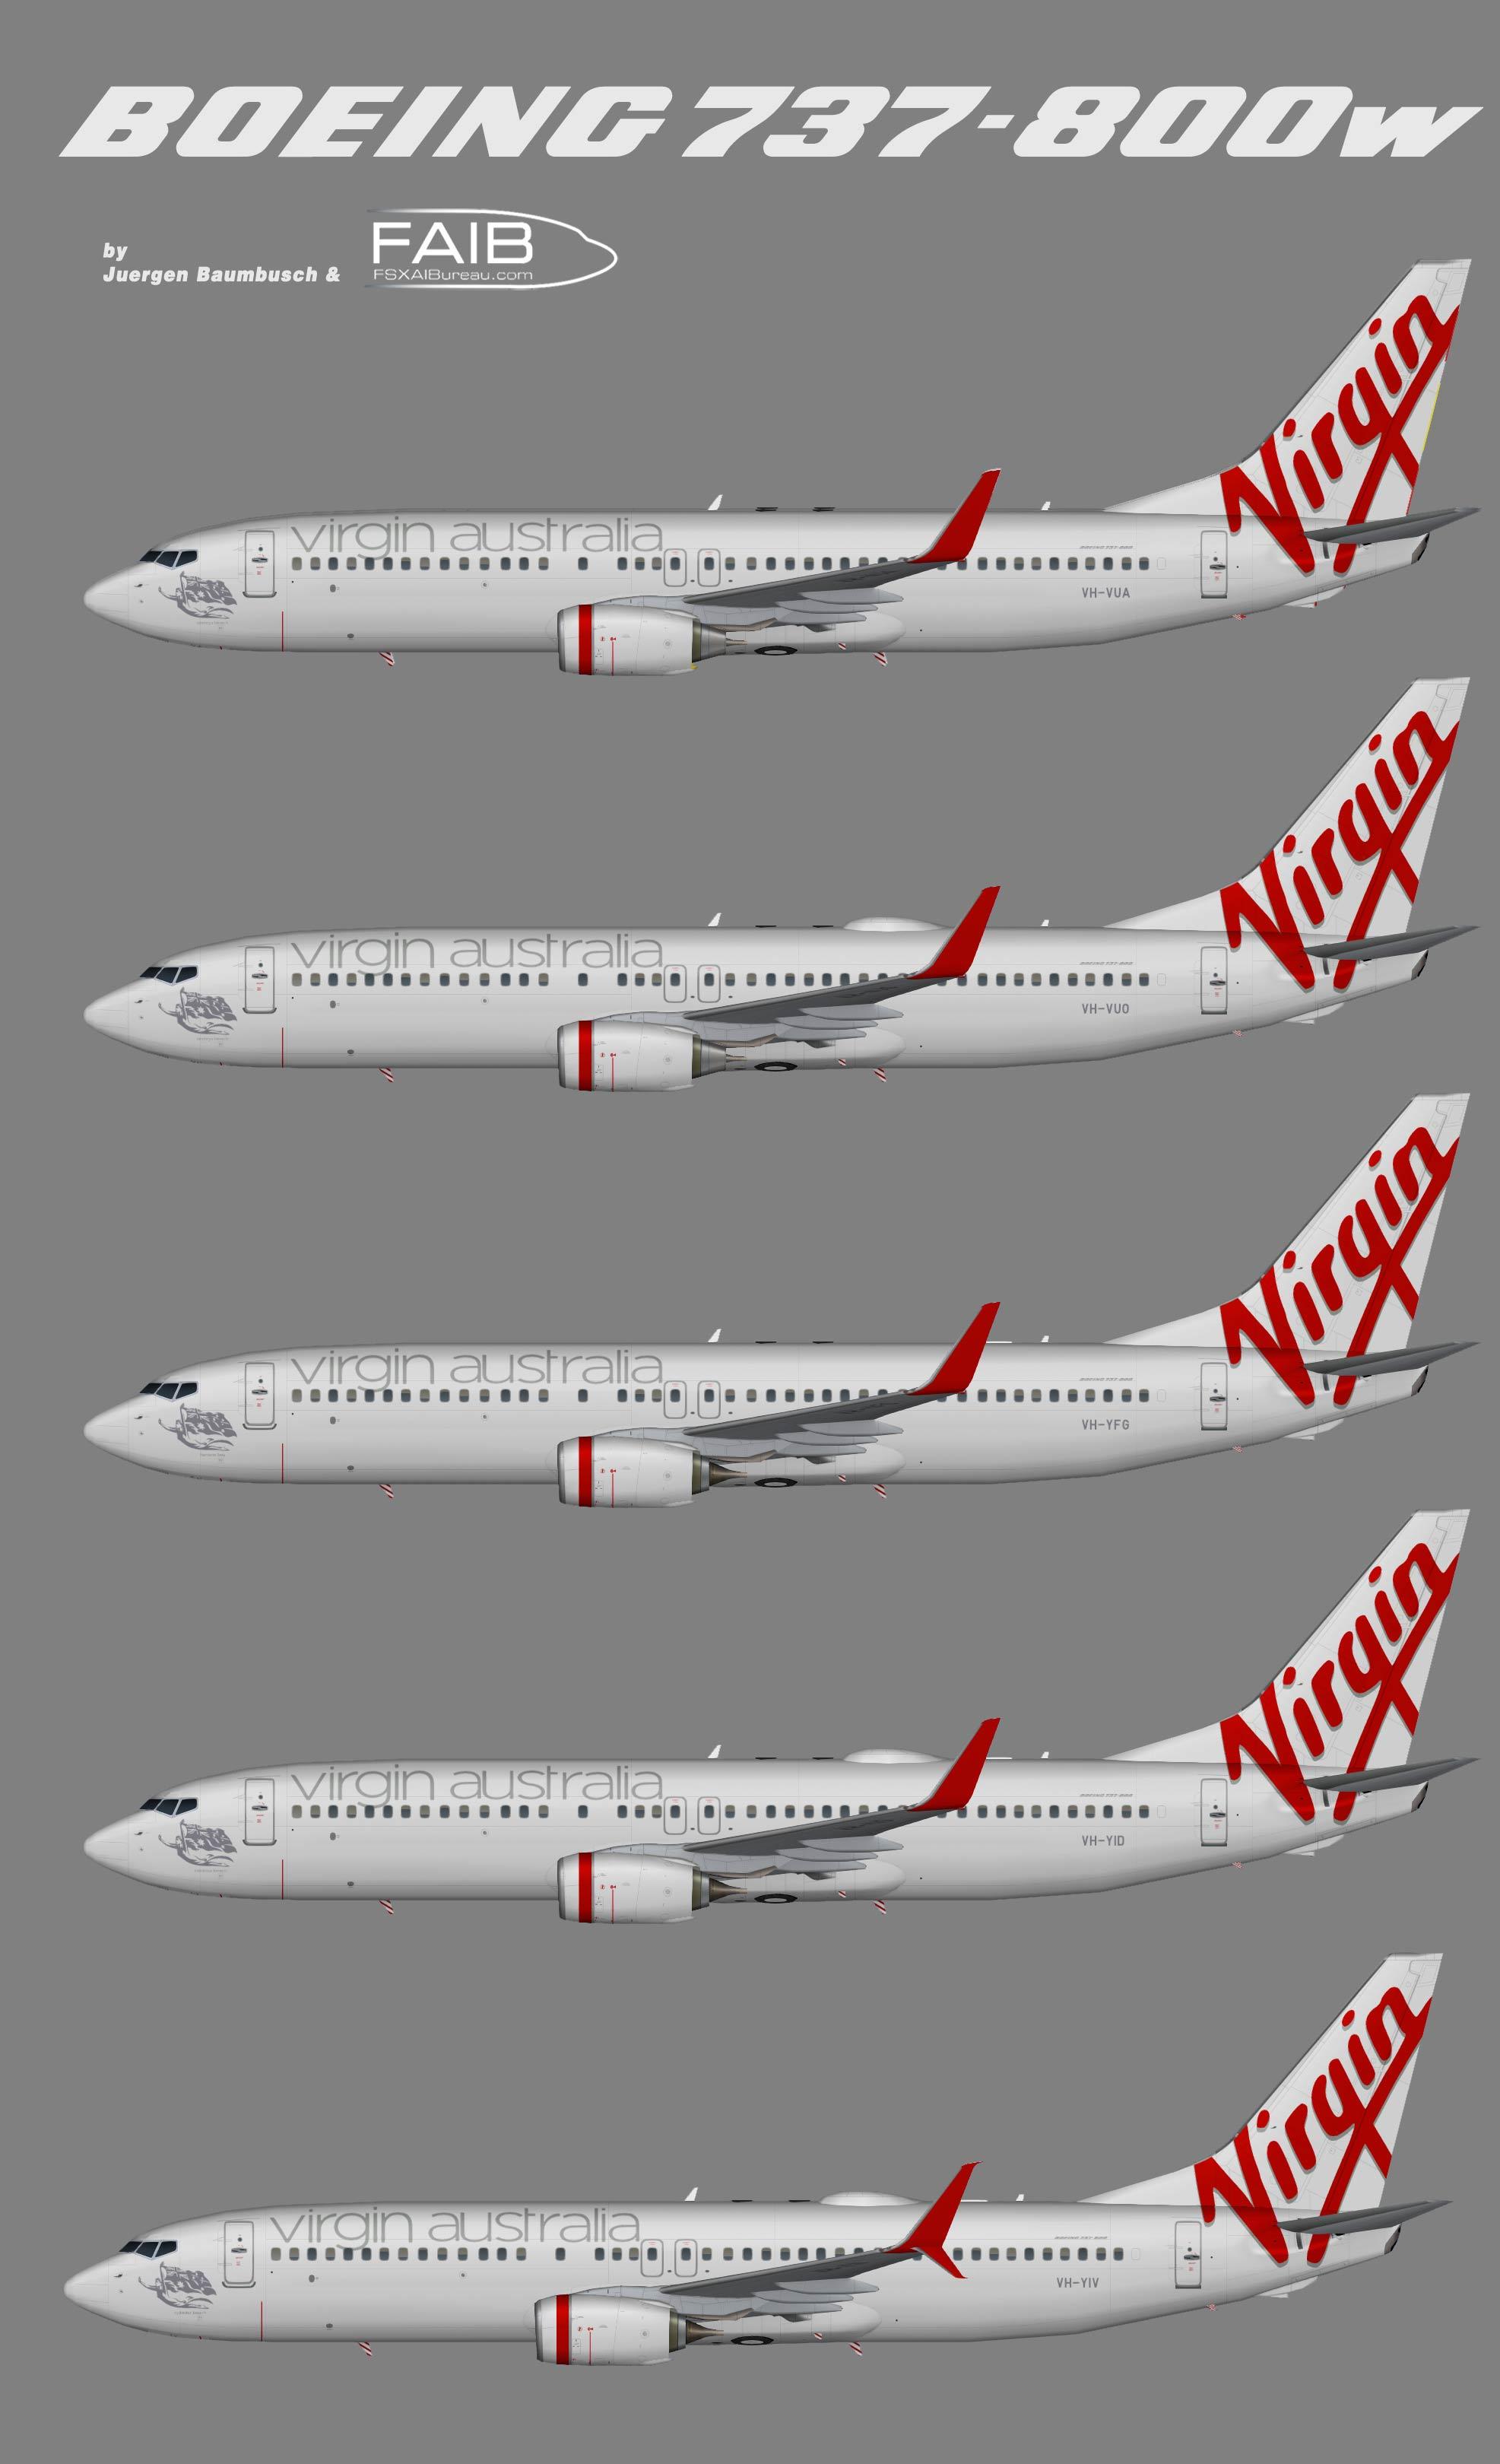 Virgin Australia Boeing 737-800w